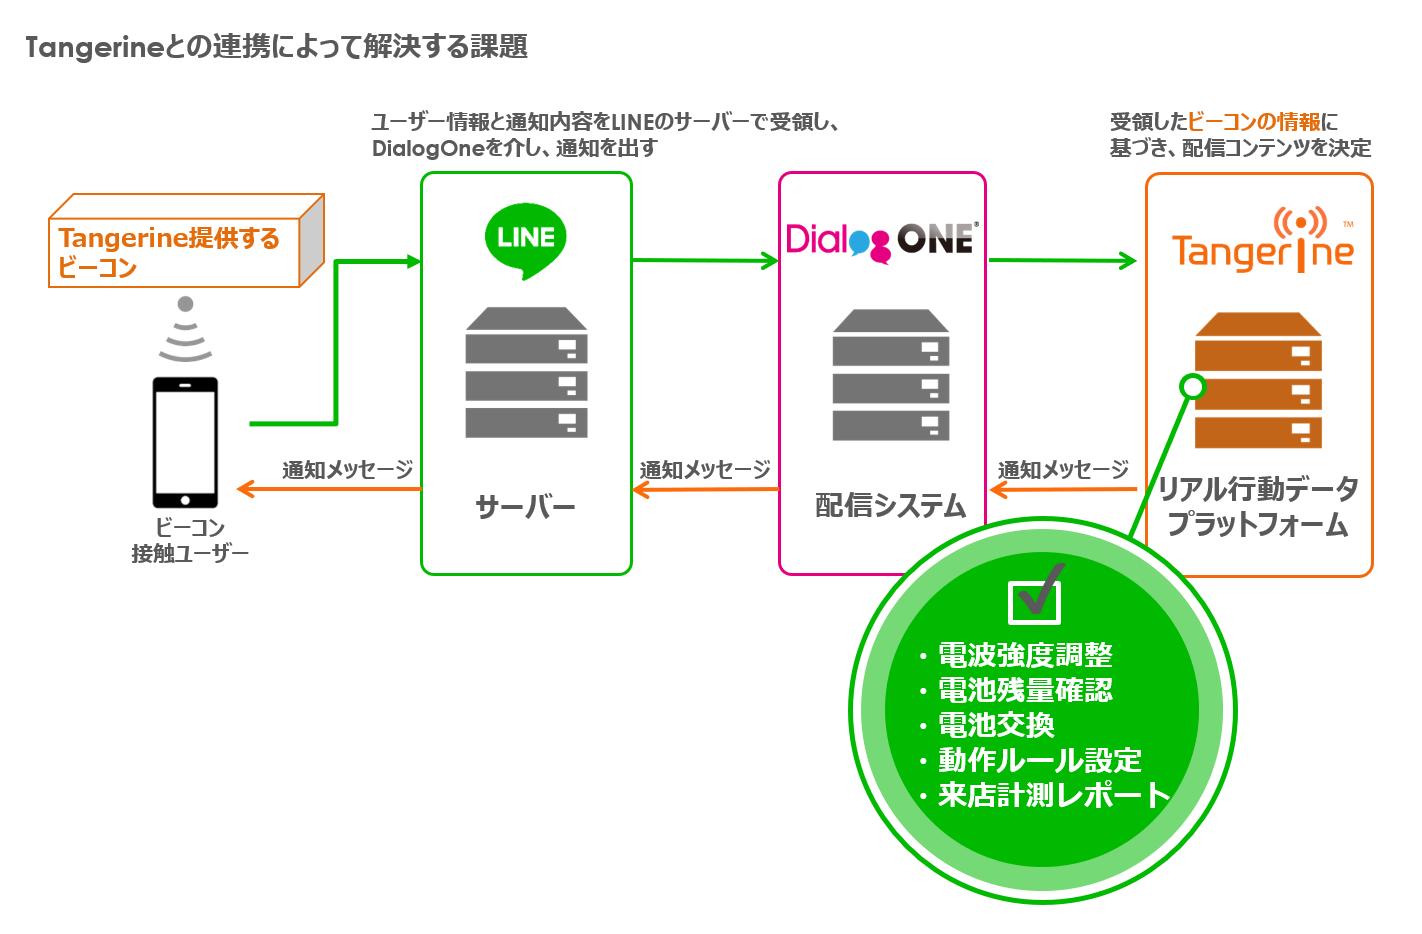 dialogone-link-tangerine-image3